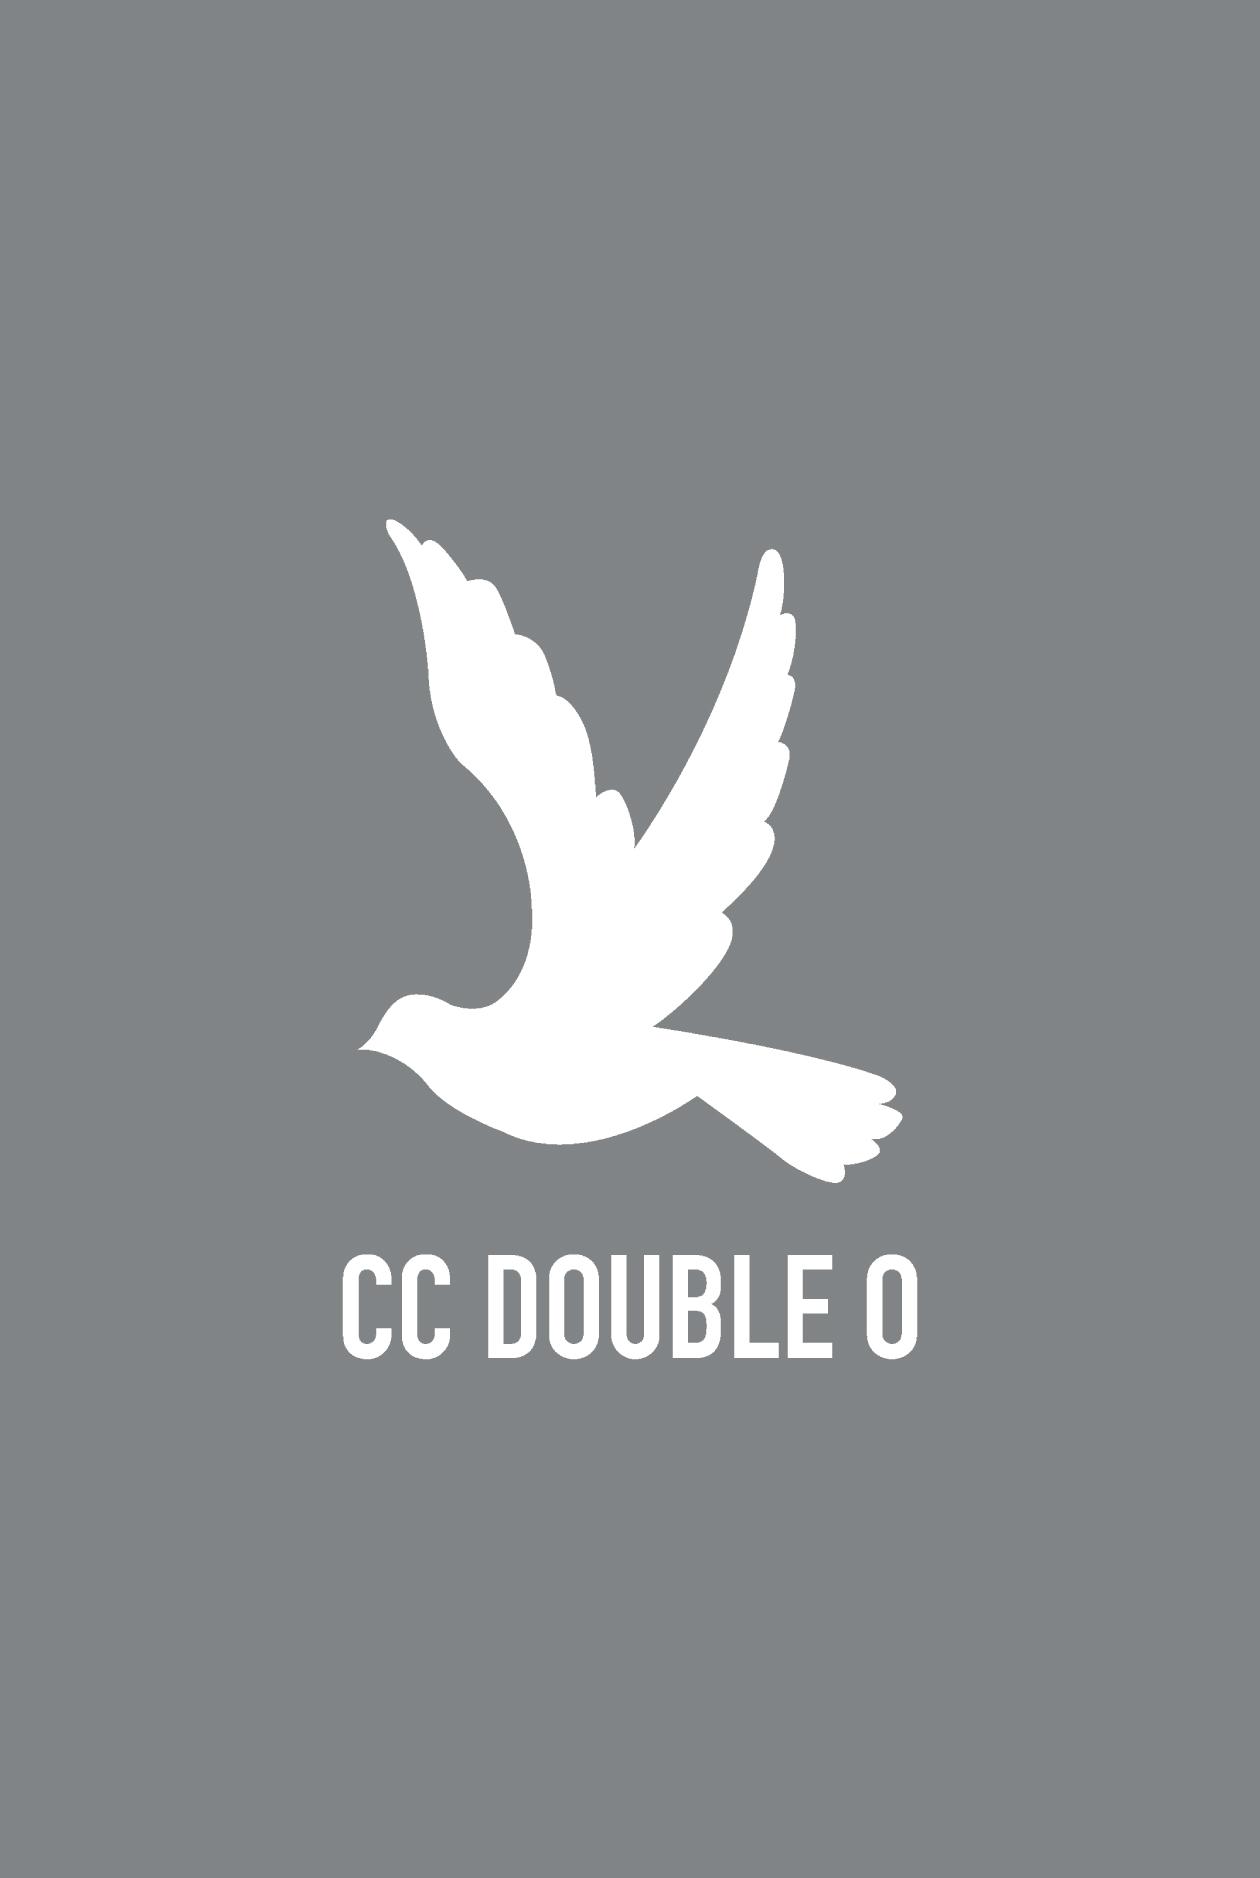 BIRD LOGO LONG-SLEEVED BUTTON DOWN CHECKERED SHIRT